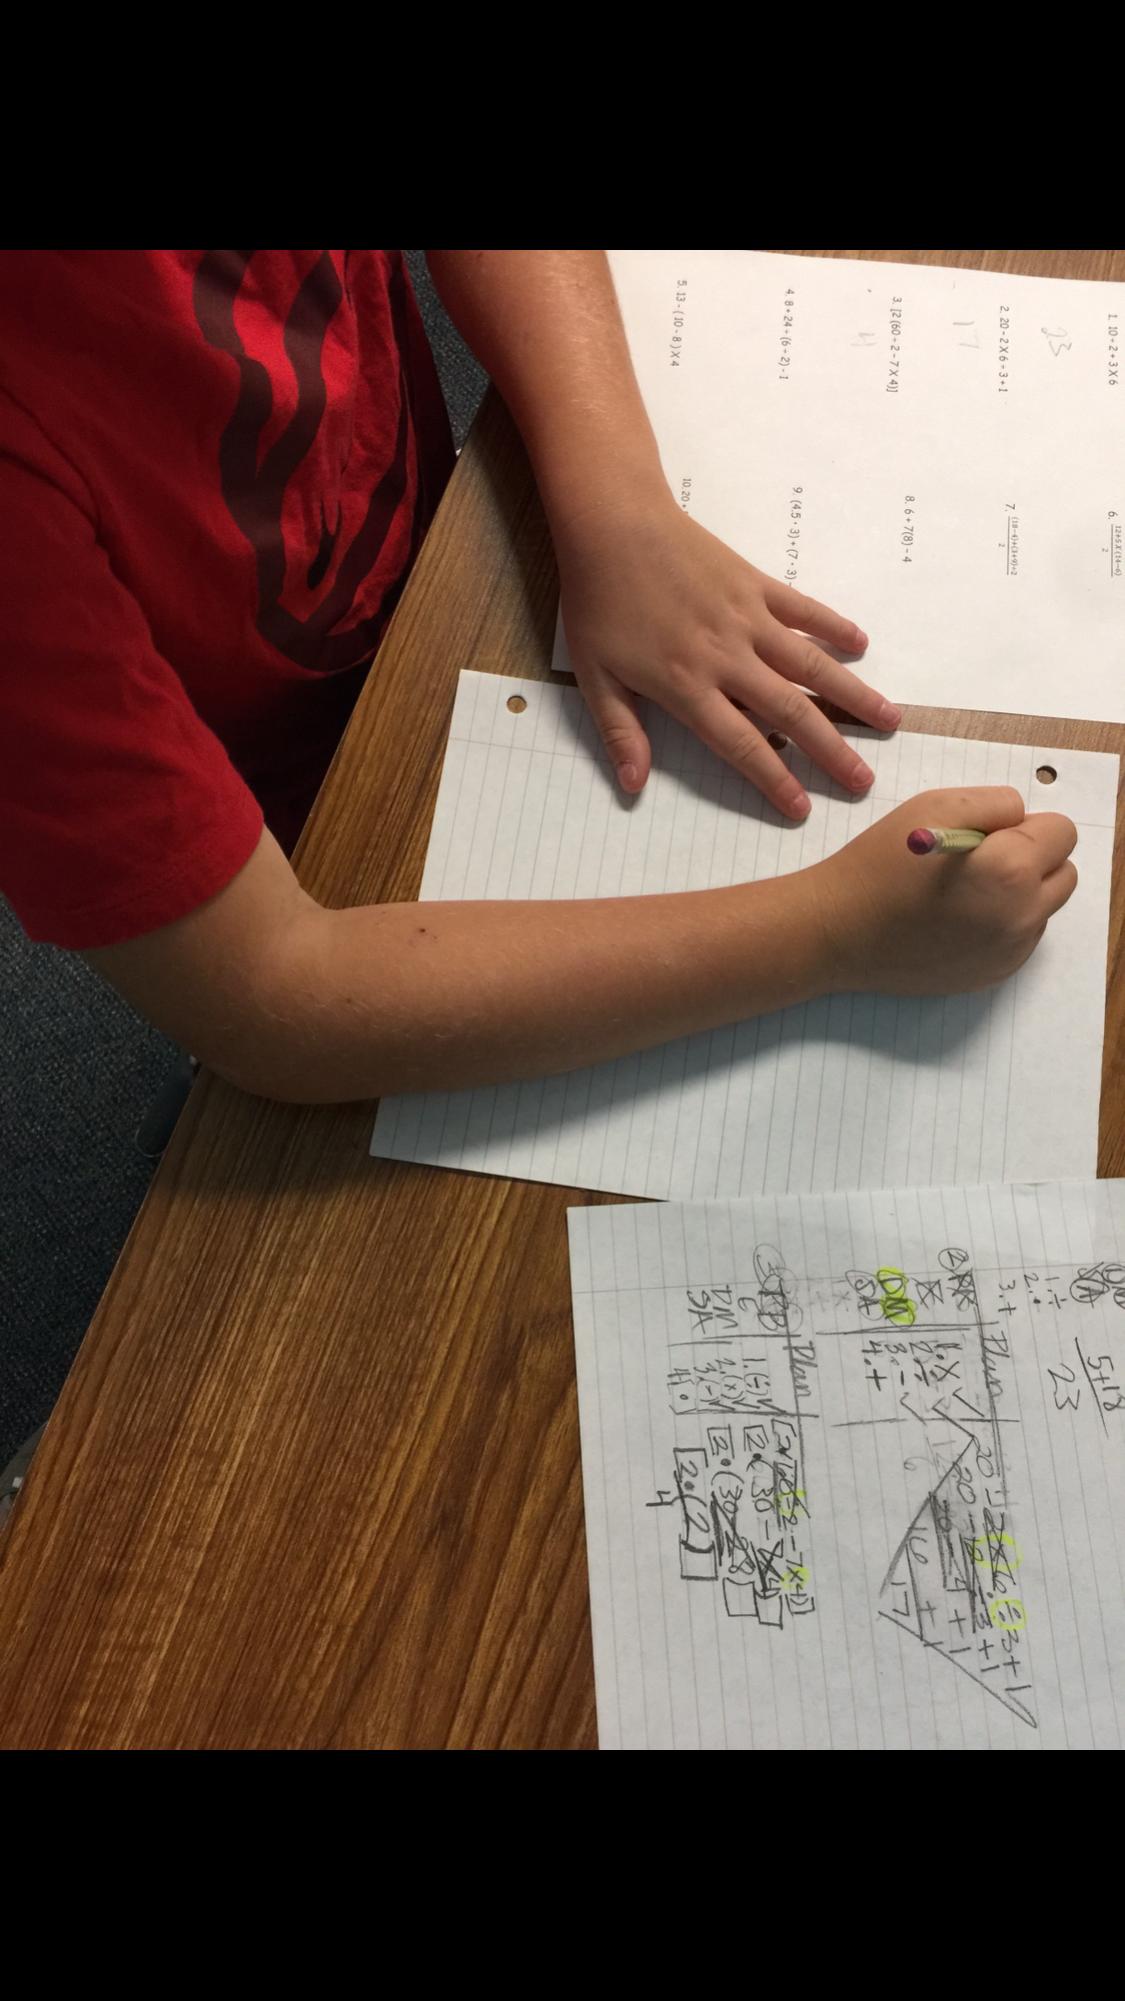 Order Of Operations Thinking Mat 5th Grade Math Life